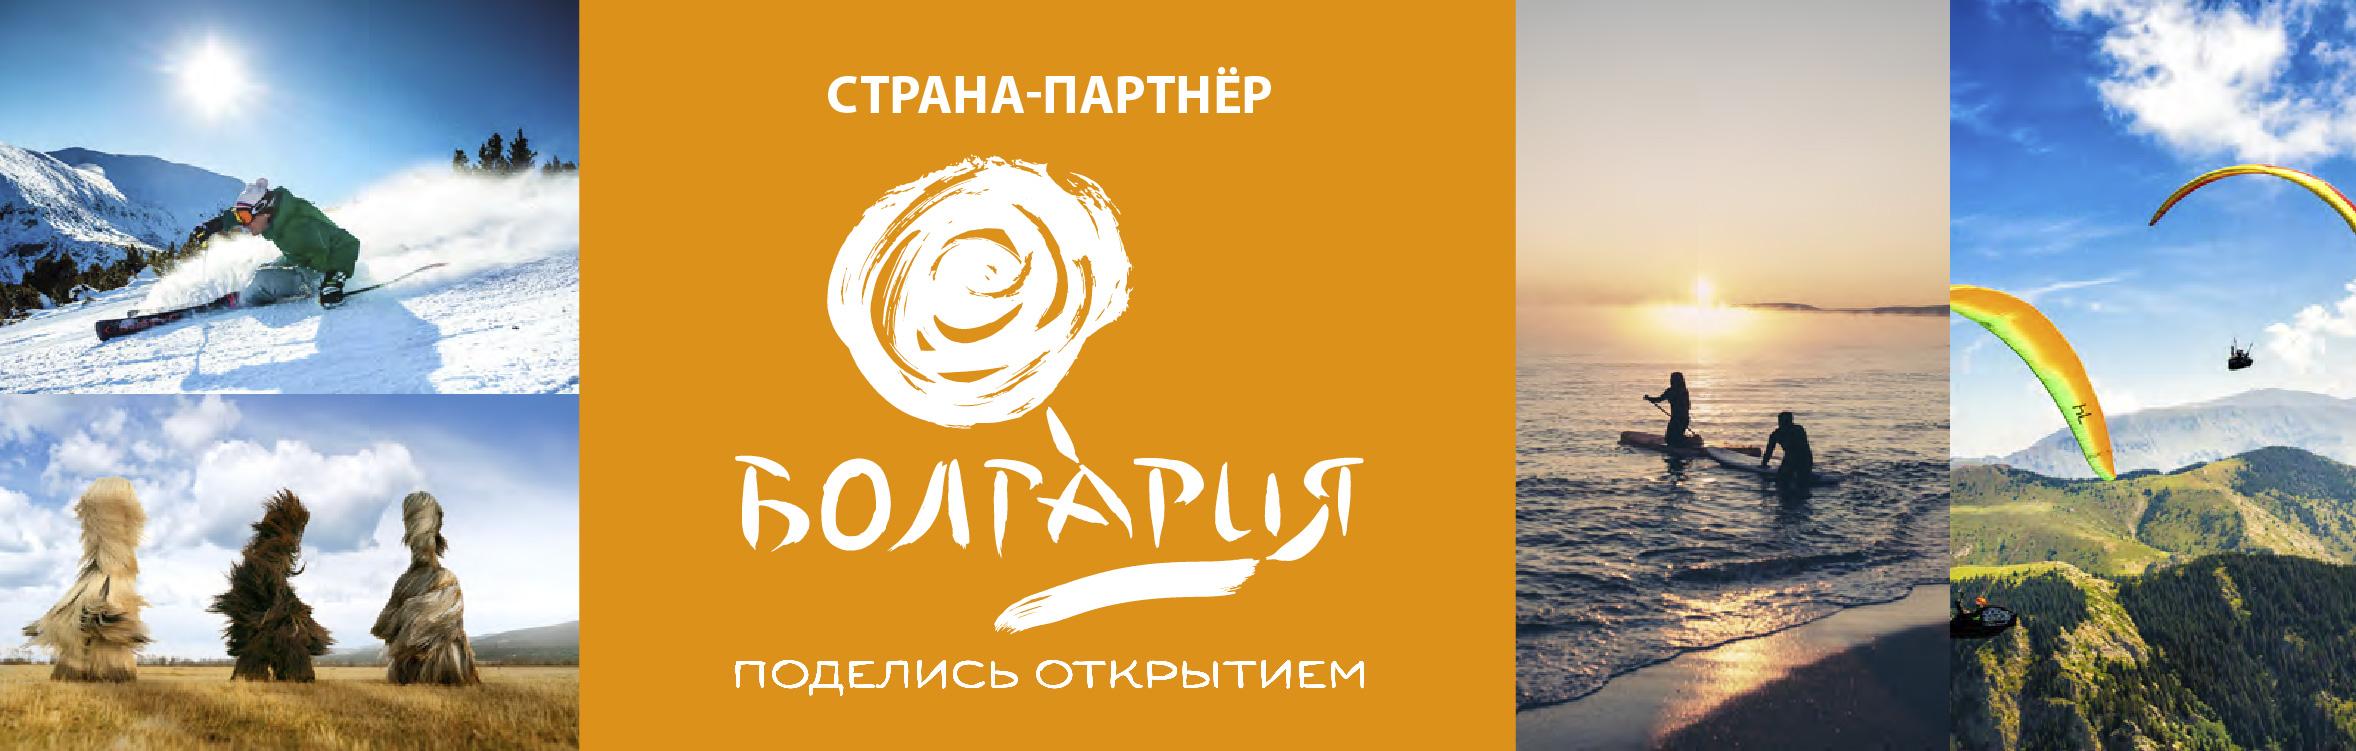 Болгария — участник и «Страна-Партнер» ОТДЫХ Leisure 2020